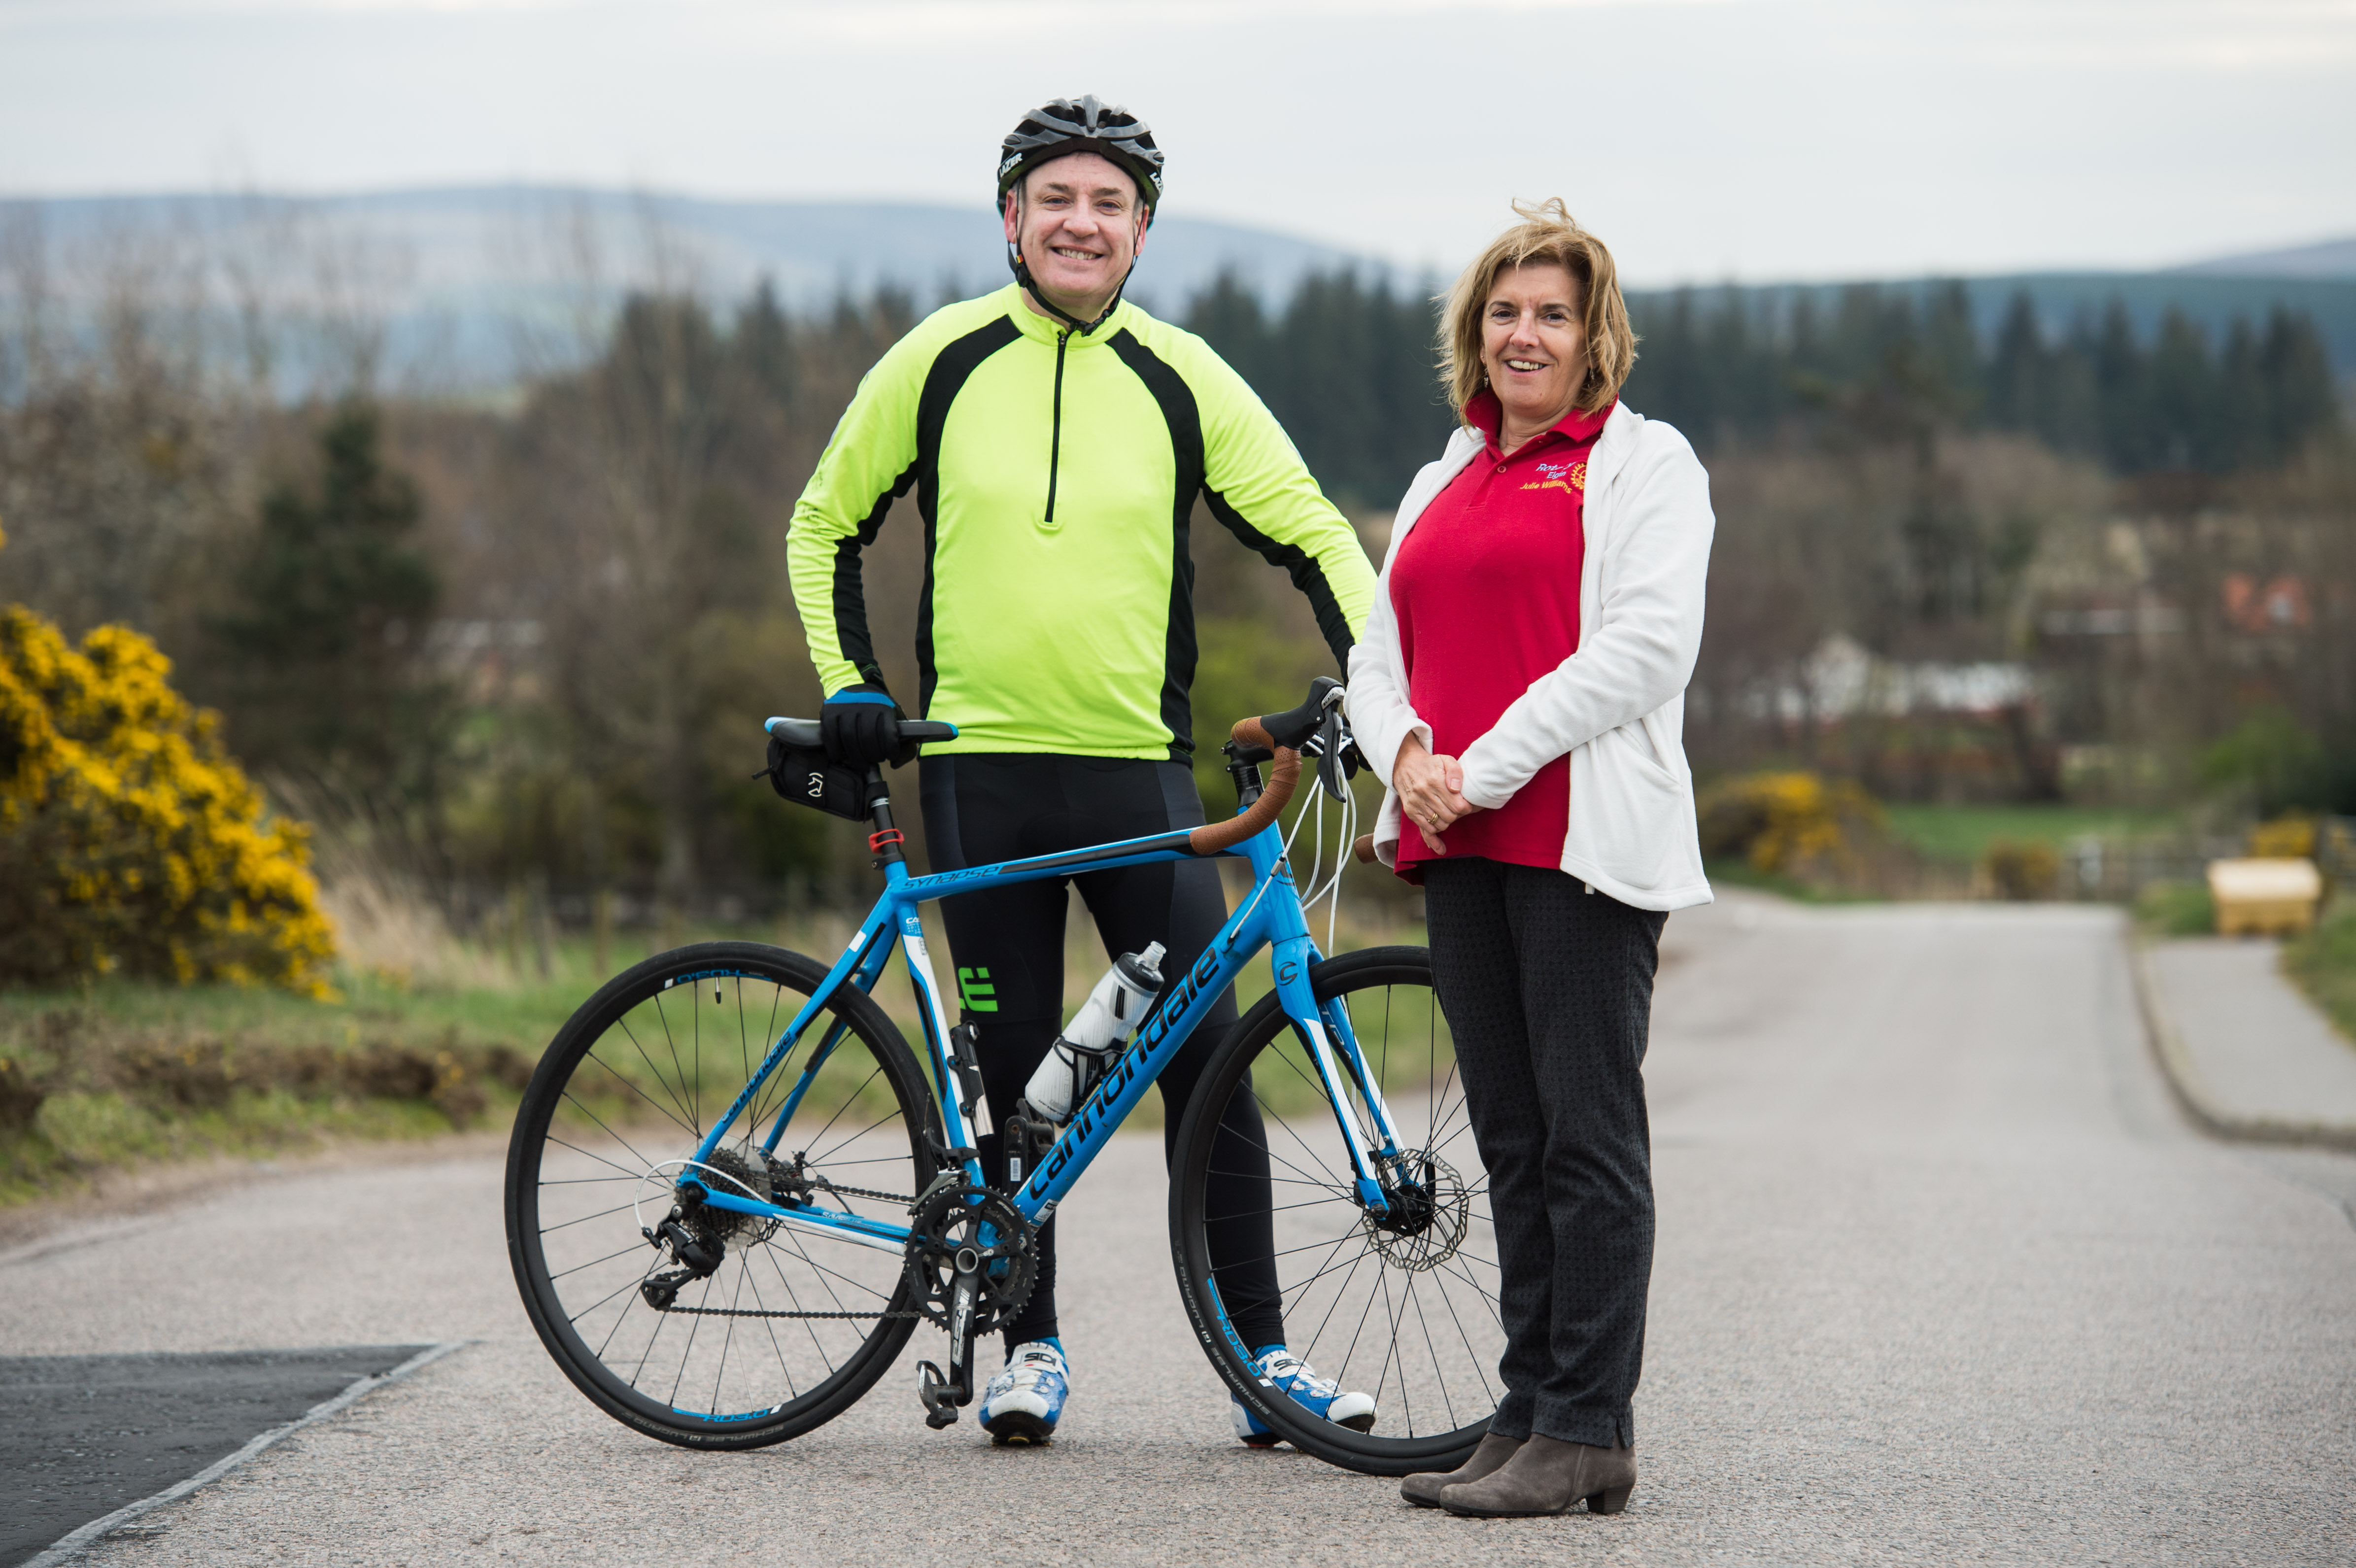 Moray MSP Richard Lochhead and Elgin Rotary Club member Julie Williams.